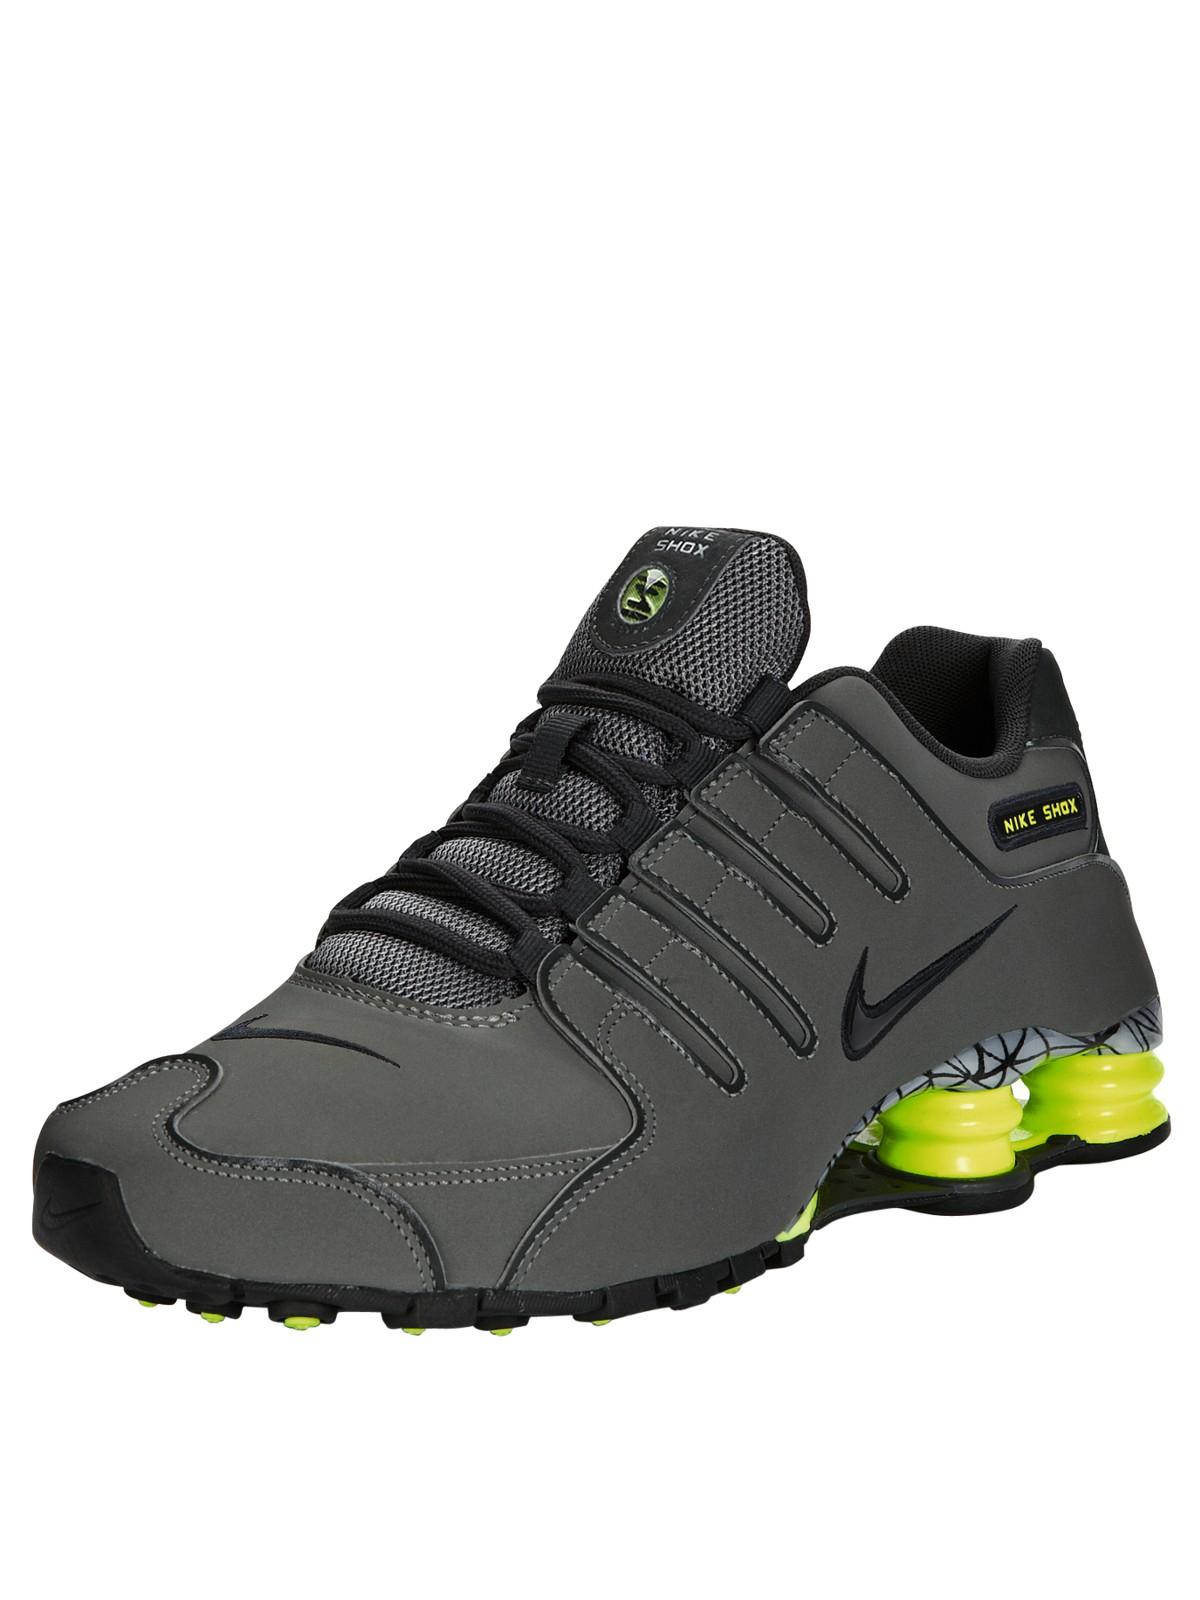 Nike Shox Nz Grey Orange